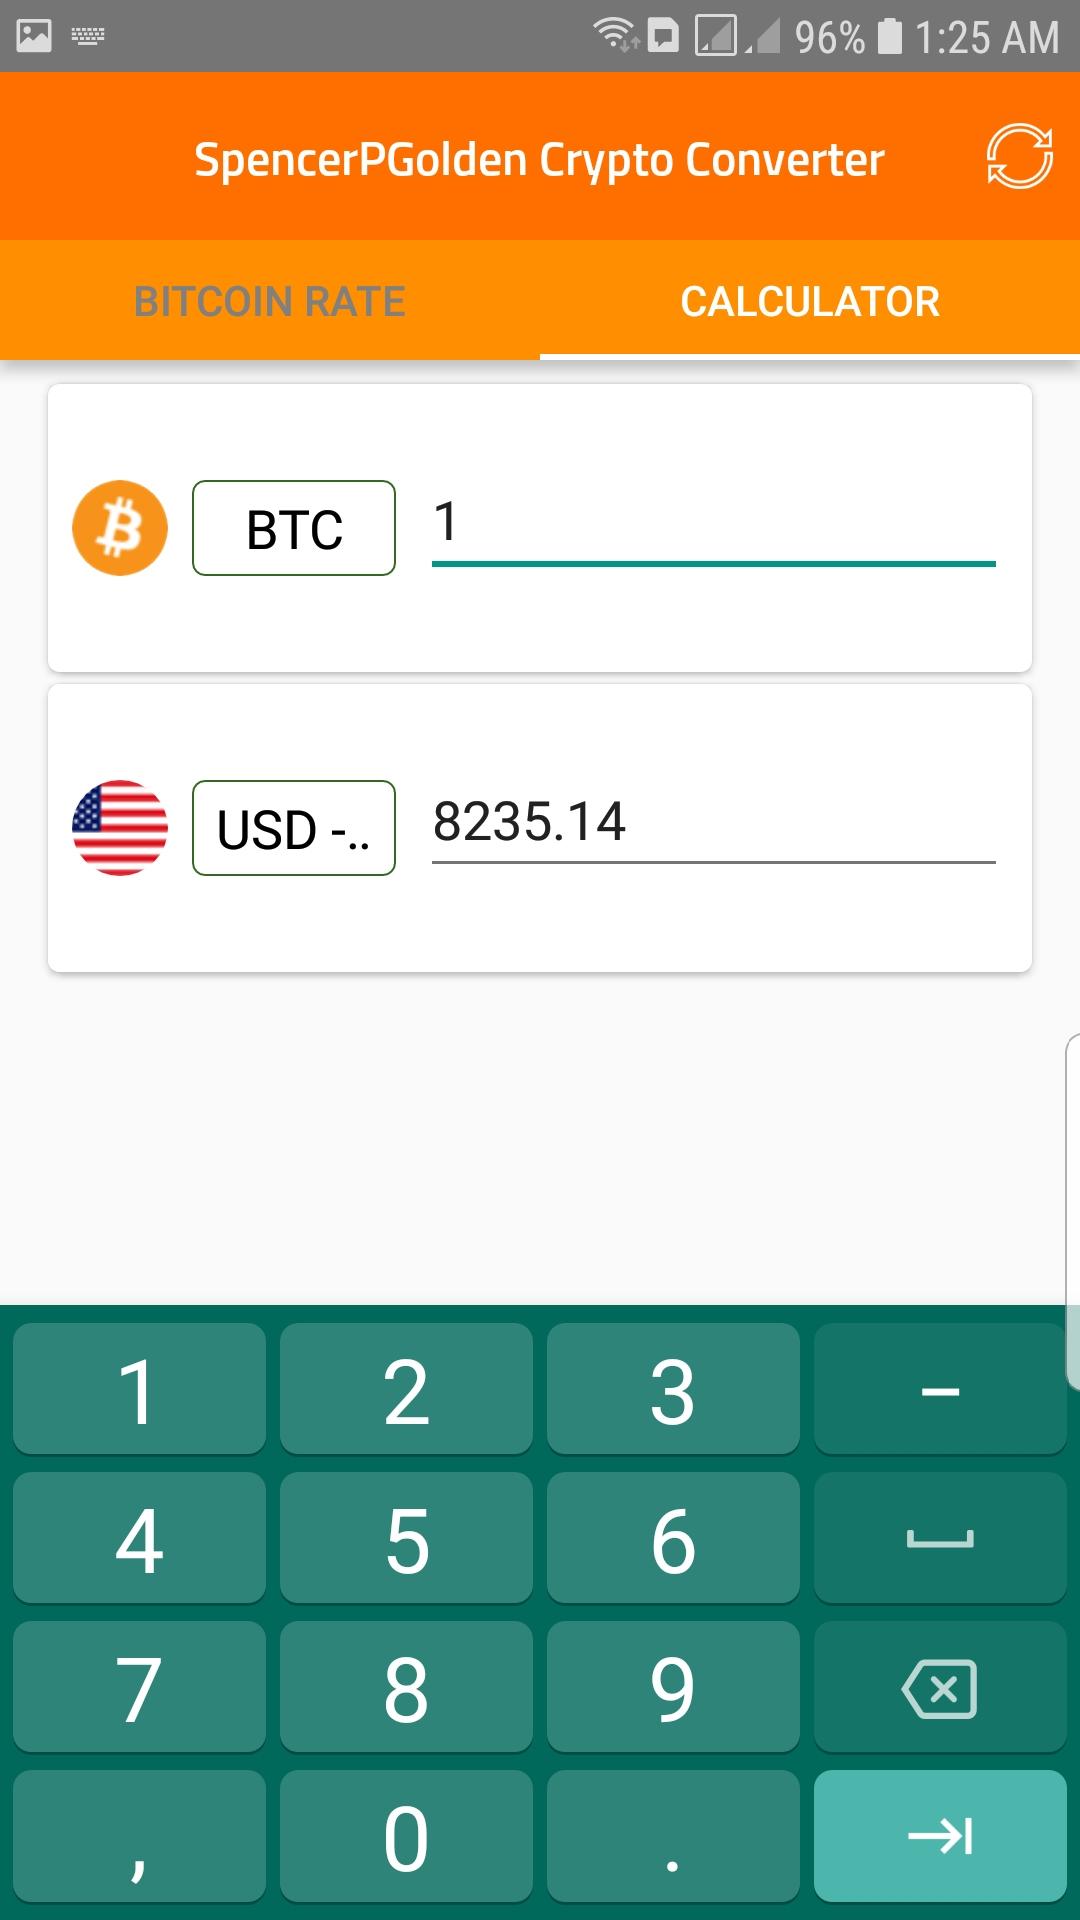 Spencer P Golden Crypto Converter: Amazon.com.br: Amazon